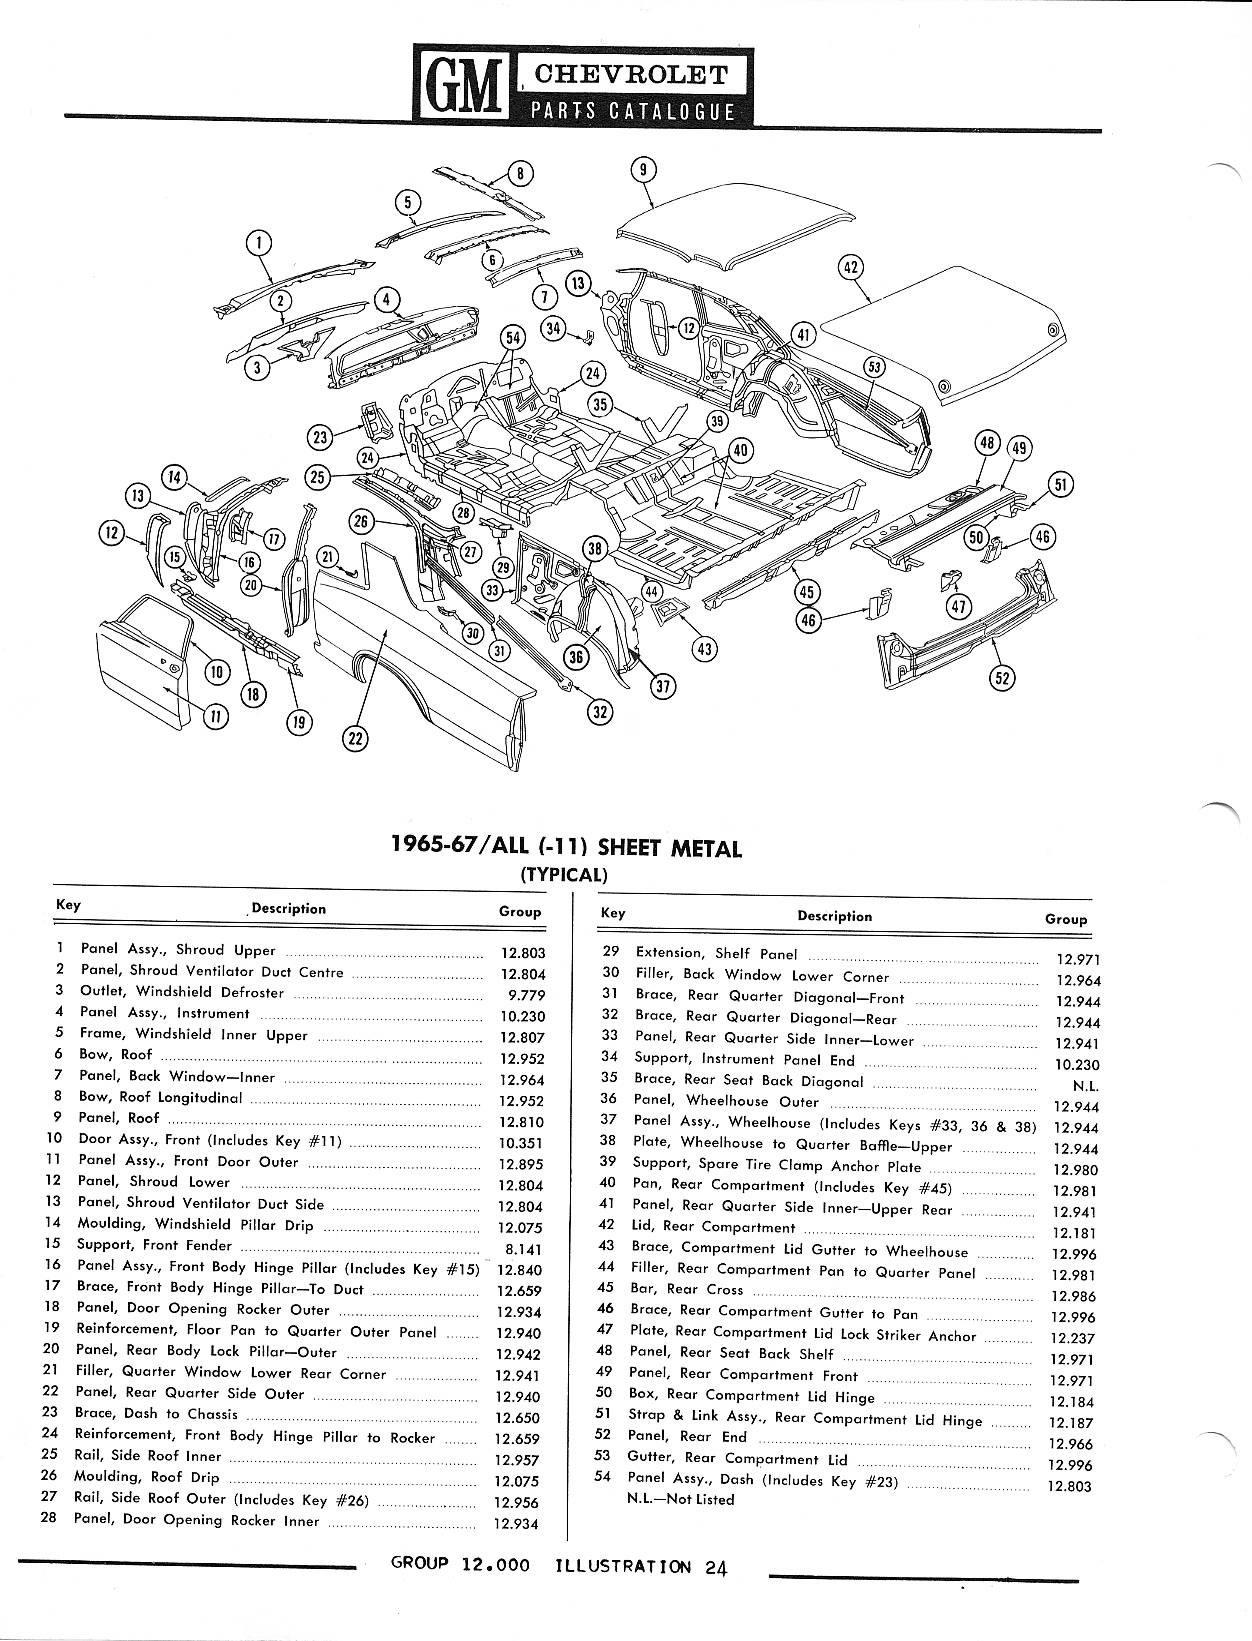 1958-1968 Chevrolet Parts Catalog / Image180.jpg